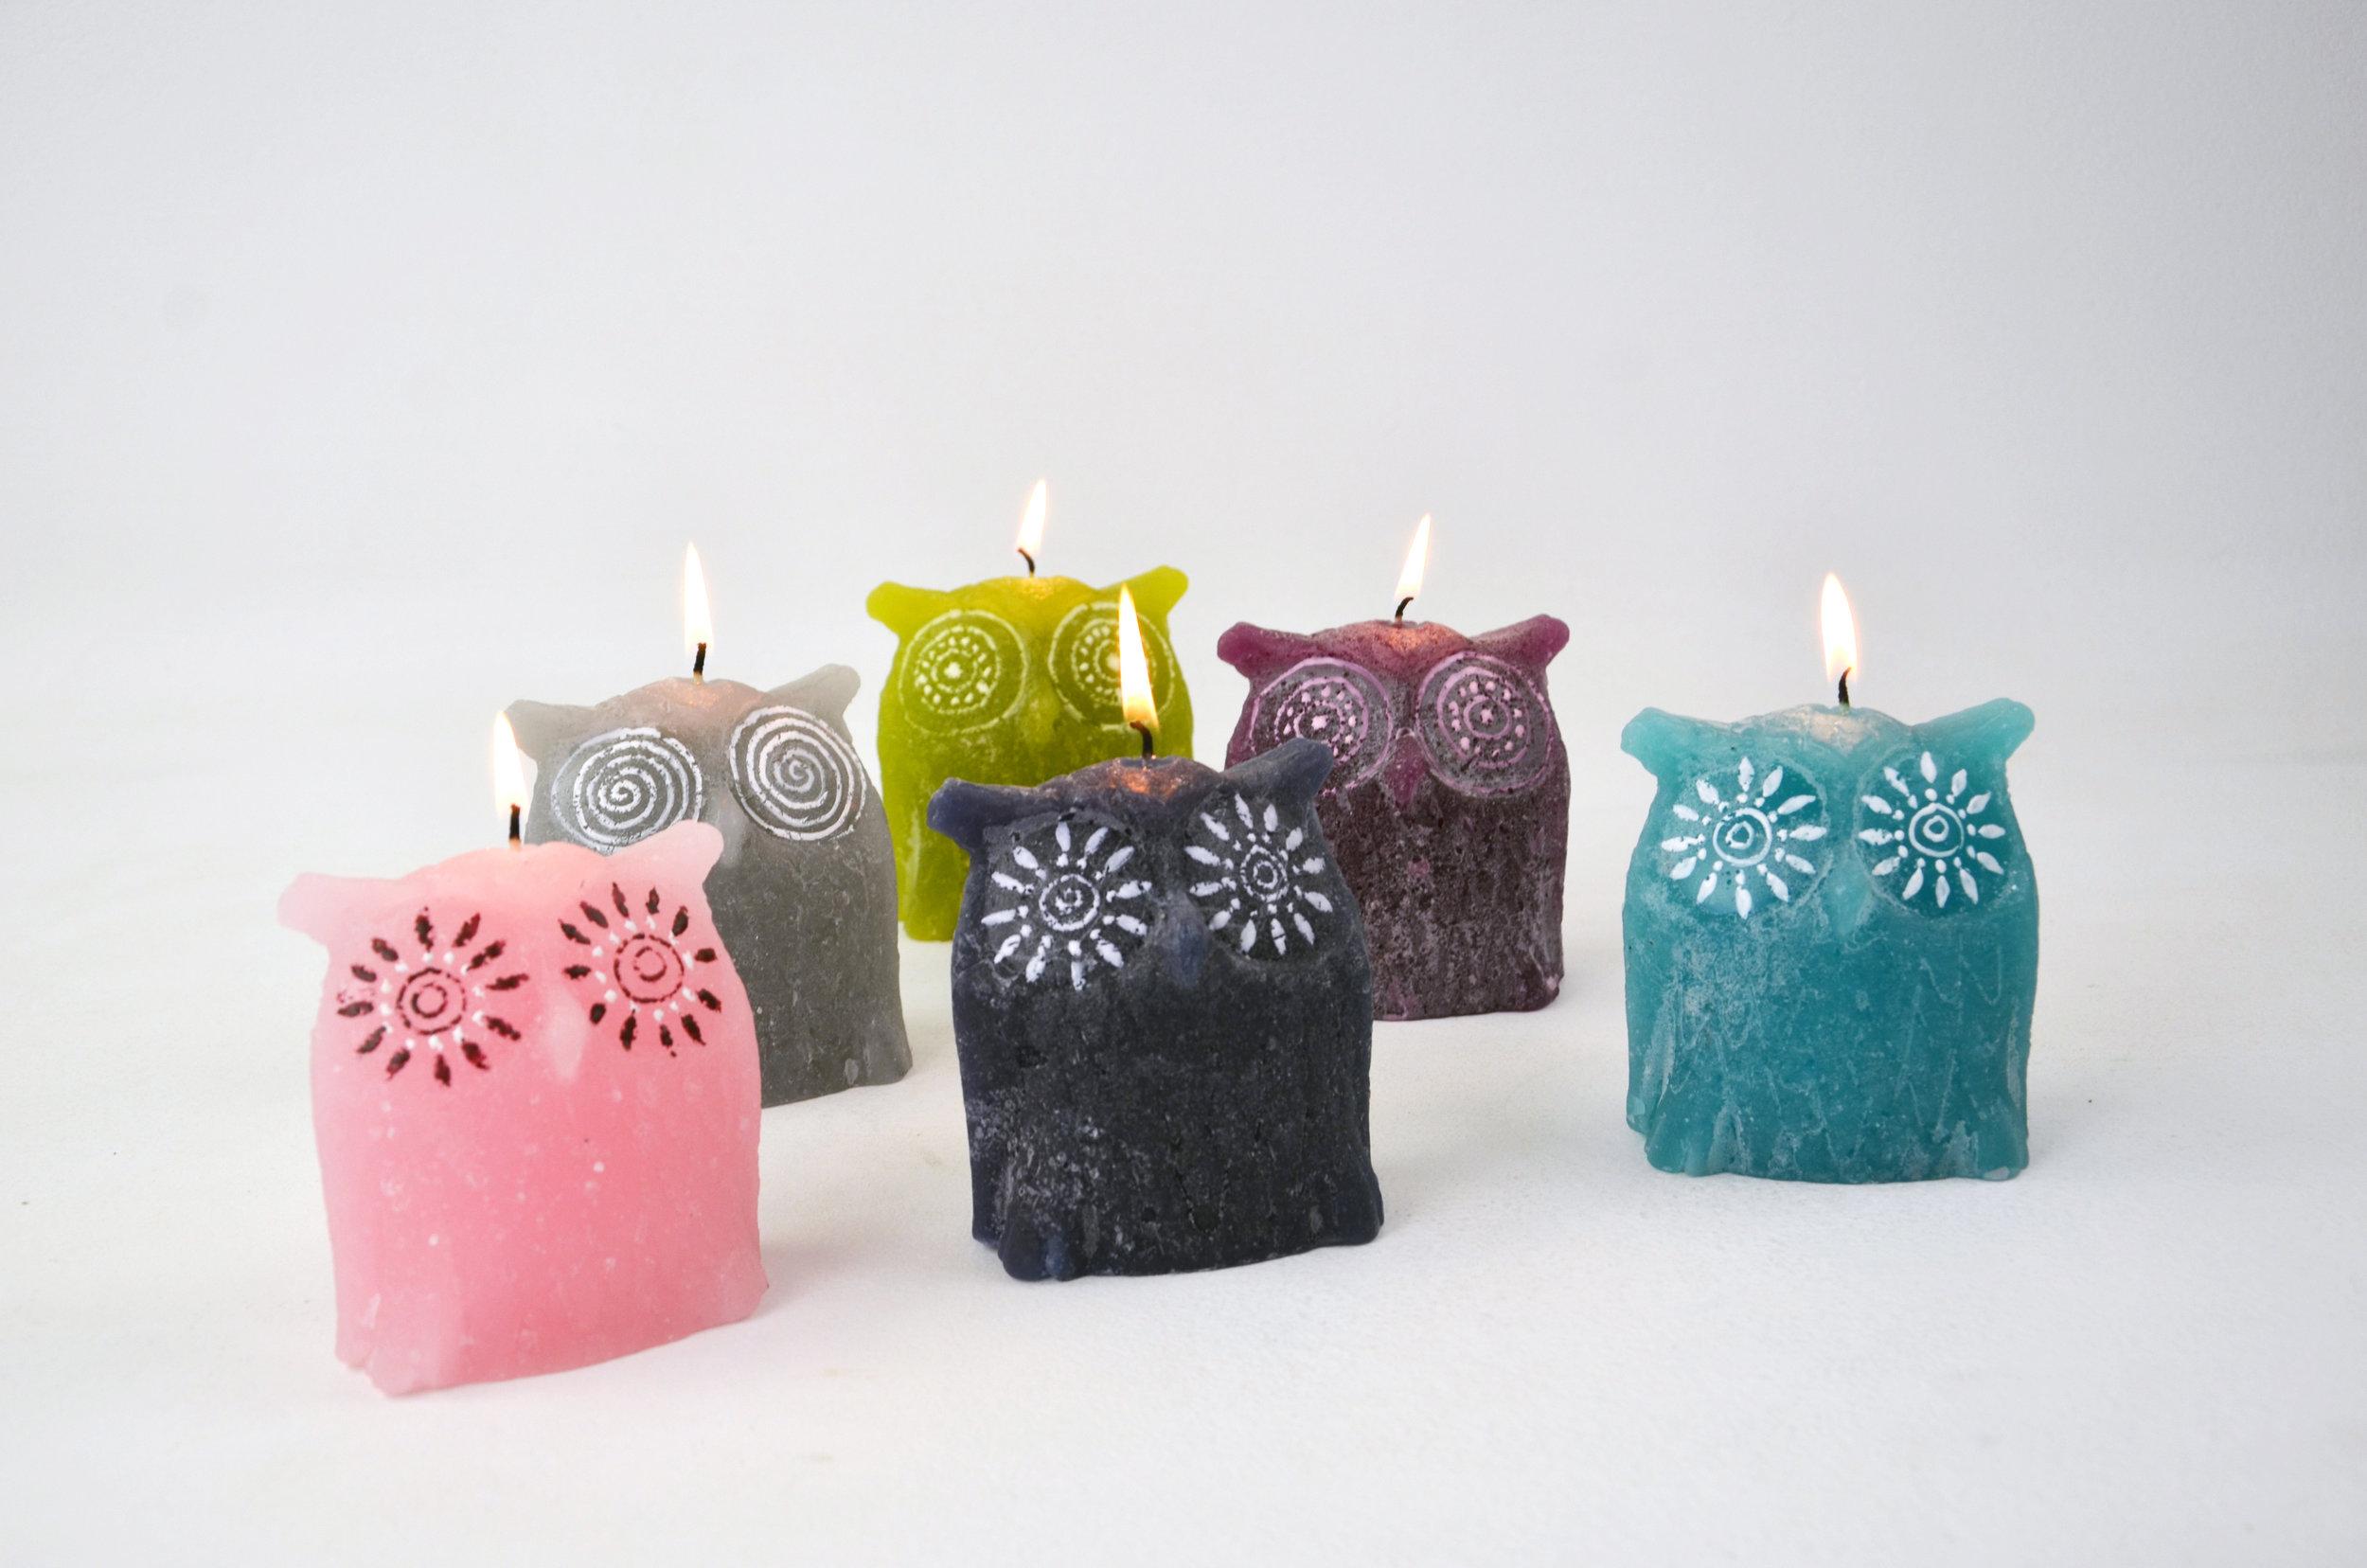 kapula-frost-figurine-candles-owls.jpg